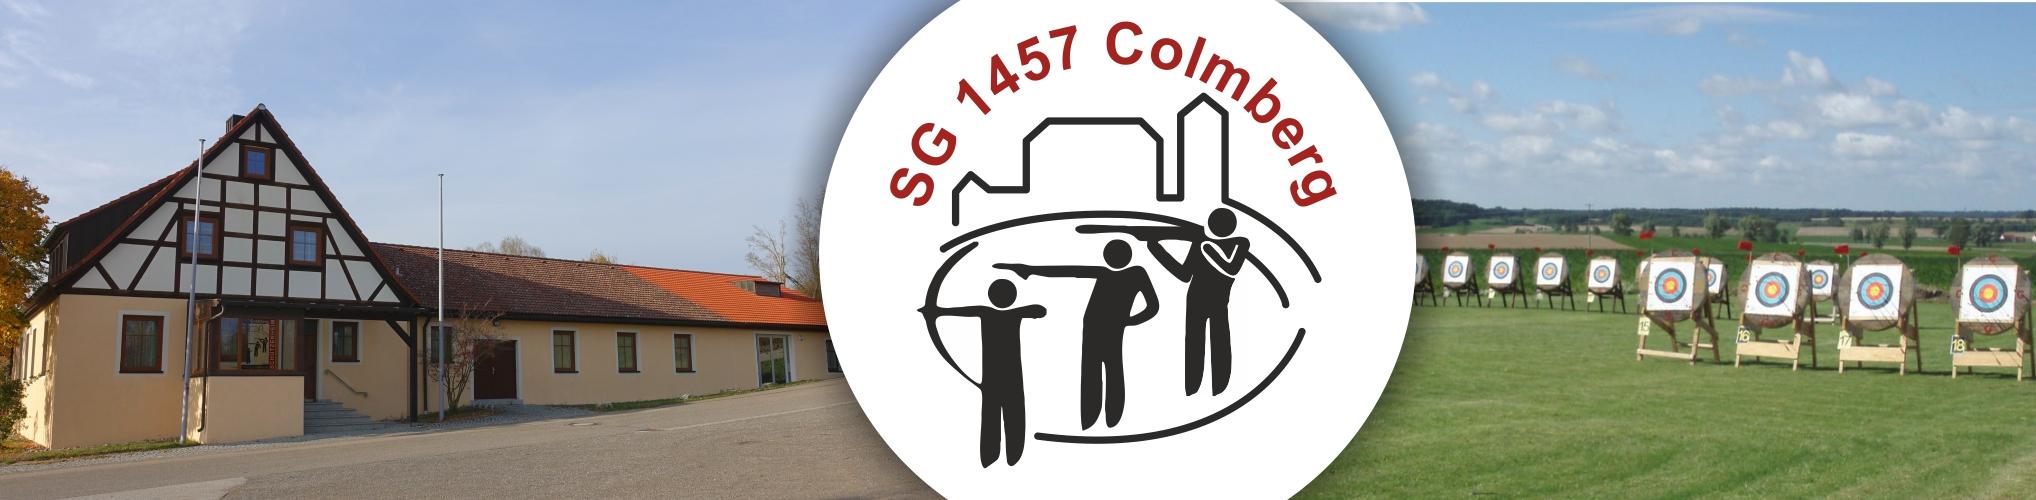 Schützengilde / Kyffhäuserkameradschaft Colmberg